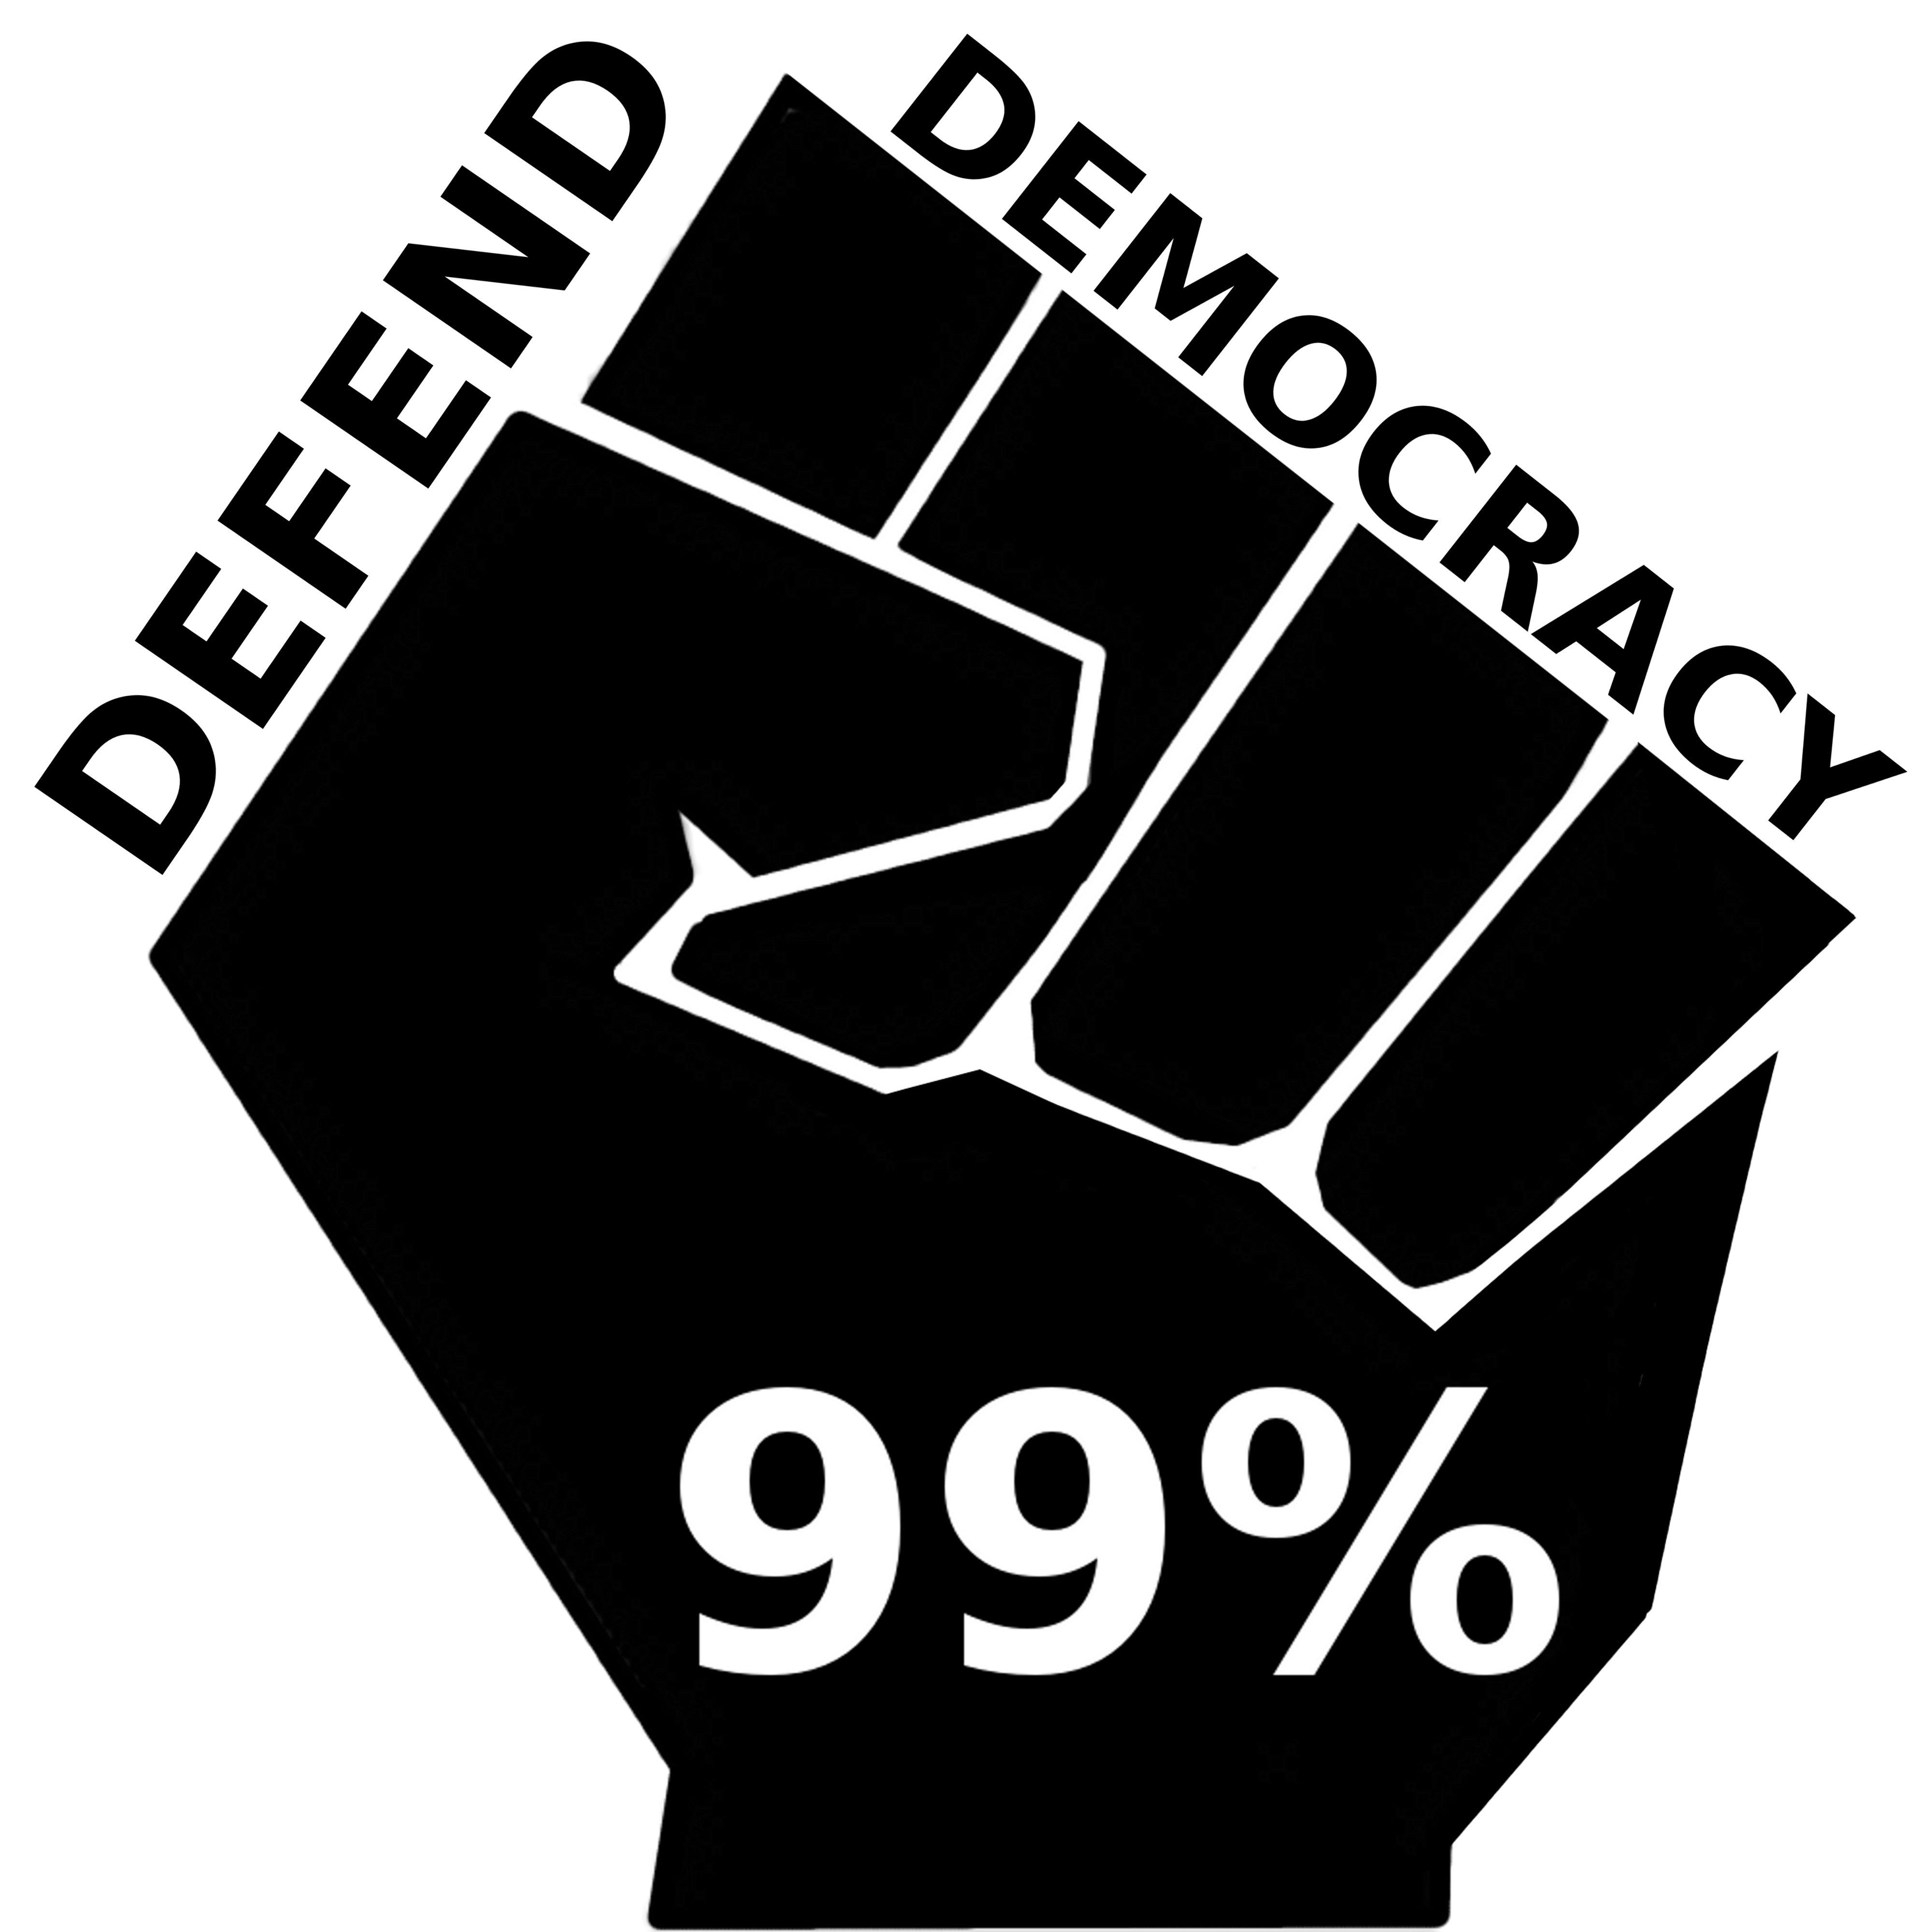 Free Democracy Cliparts, Download Free Clip Art, Free Clip.